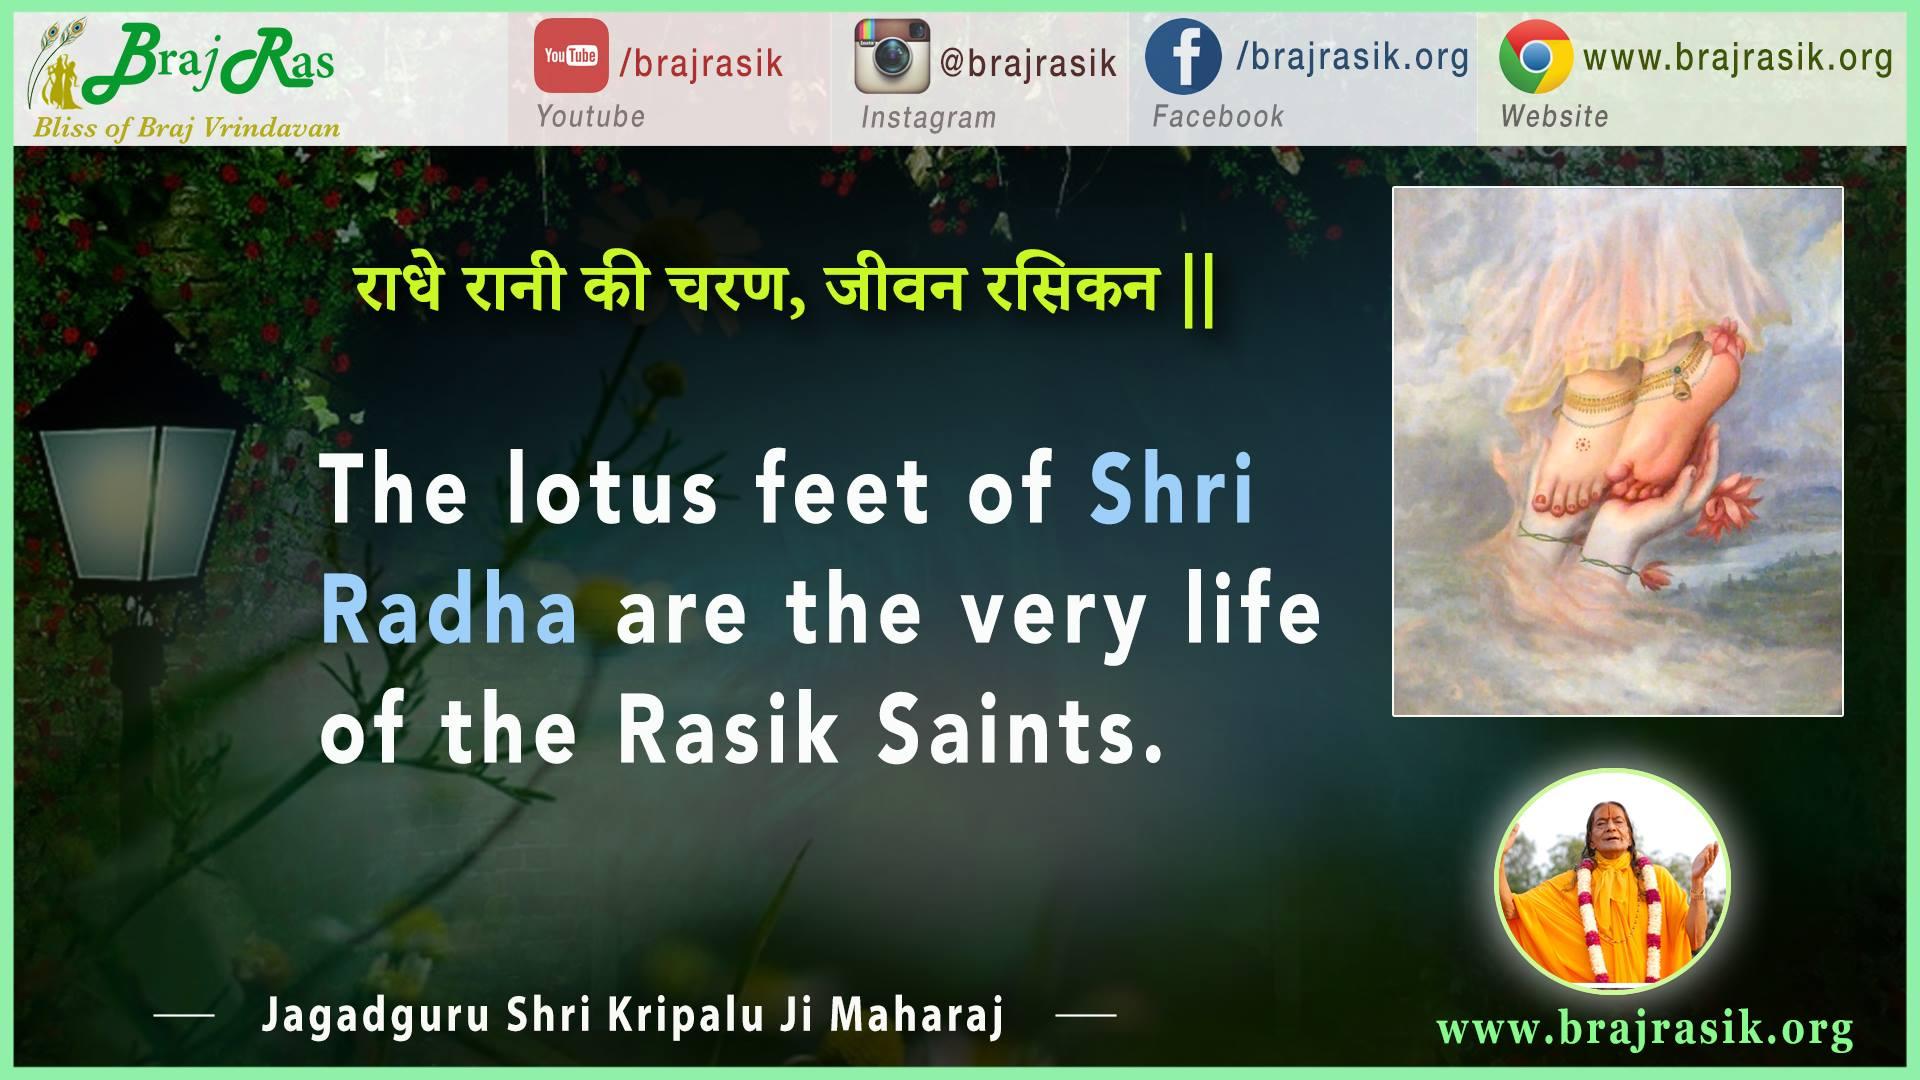 Radhey Rani Ke Charan, Jeevan Rasikan - Jagadguru Shri Kripalu Ji Maharaj